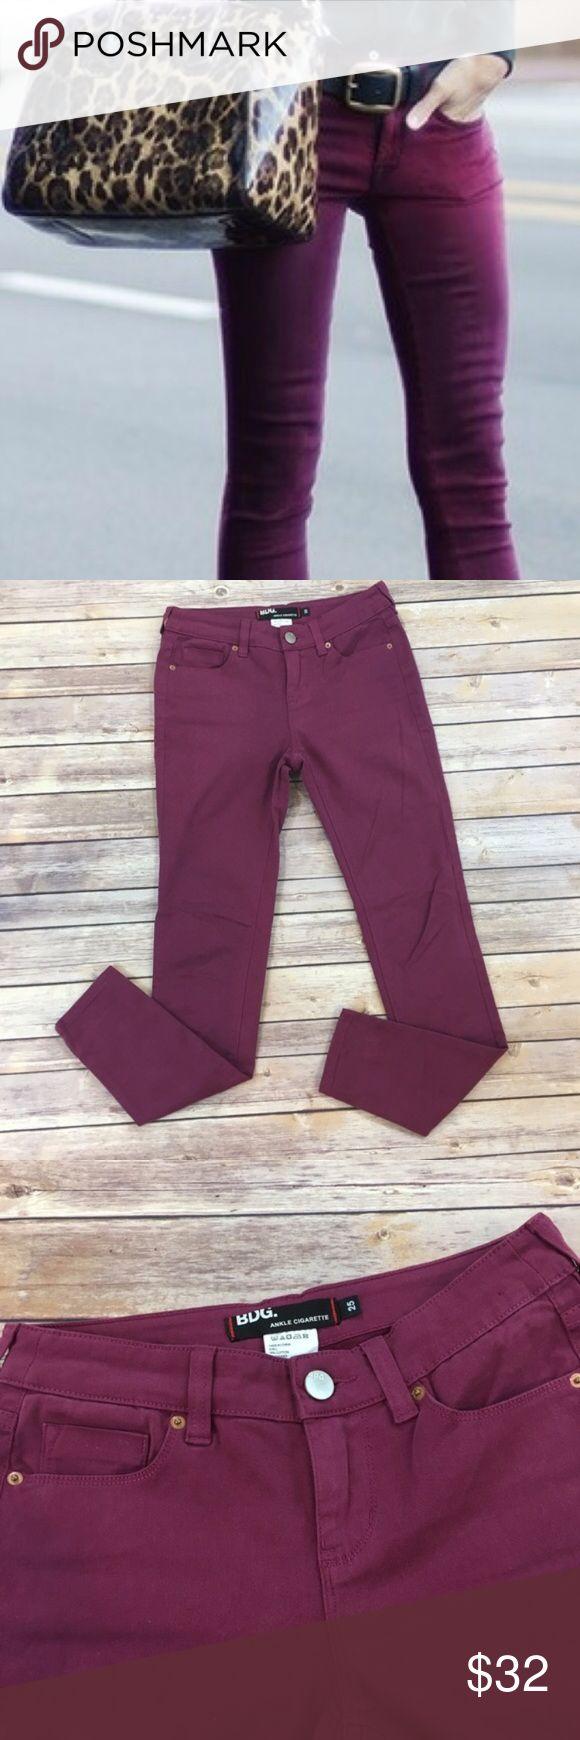 ⚡️SALE⚡️BDG Ankle Cigarette Jeans BDG by Urban Outfitters Ankle cigarette Jeans. Urban Outfitters Jeans Skinny